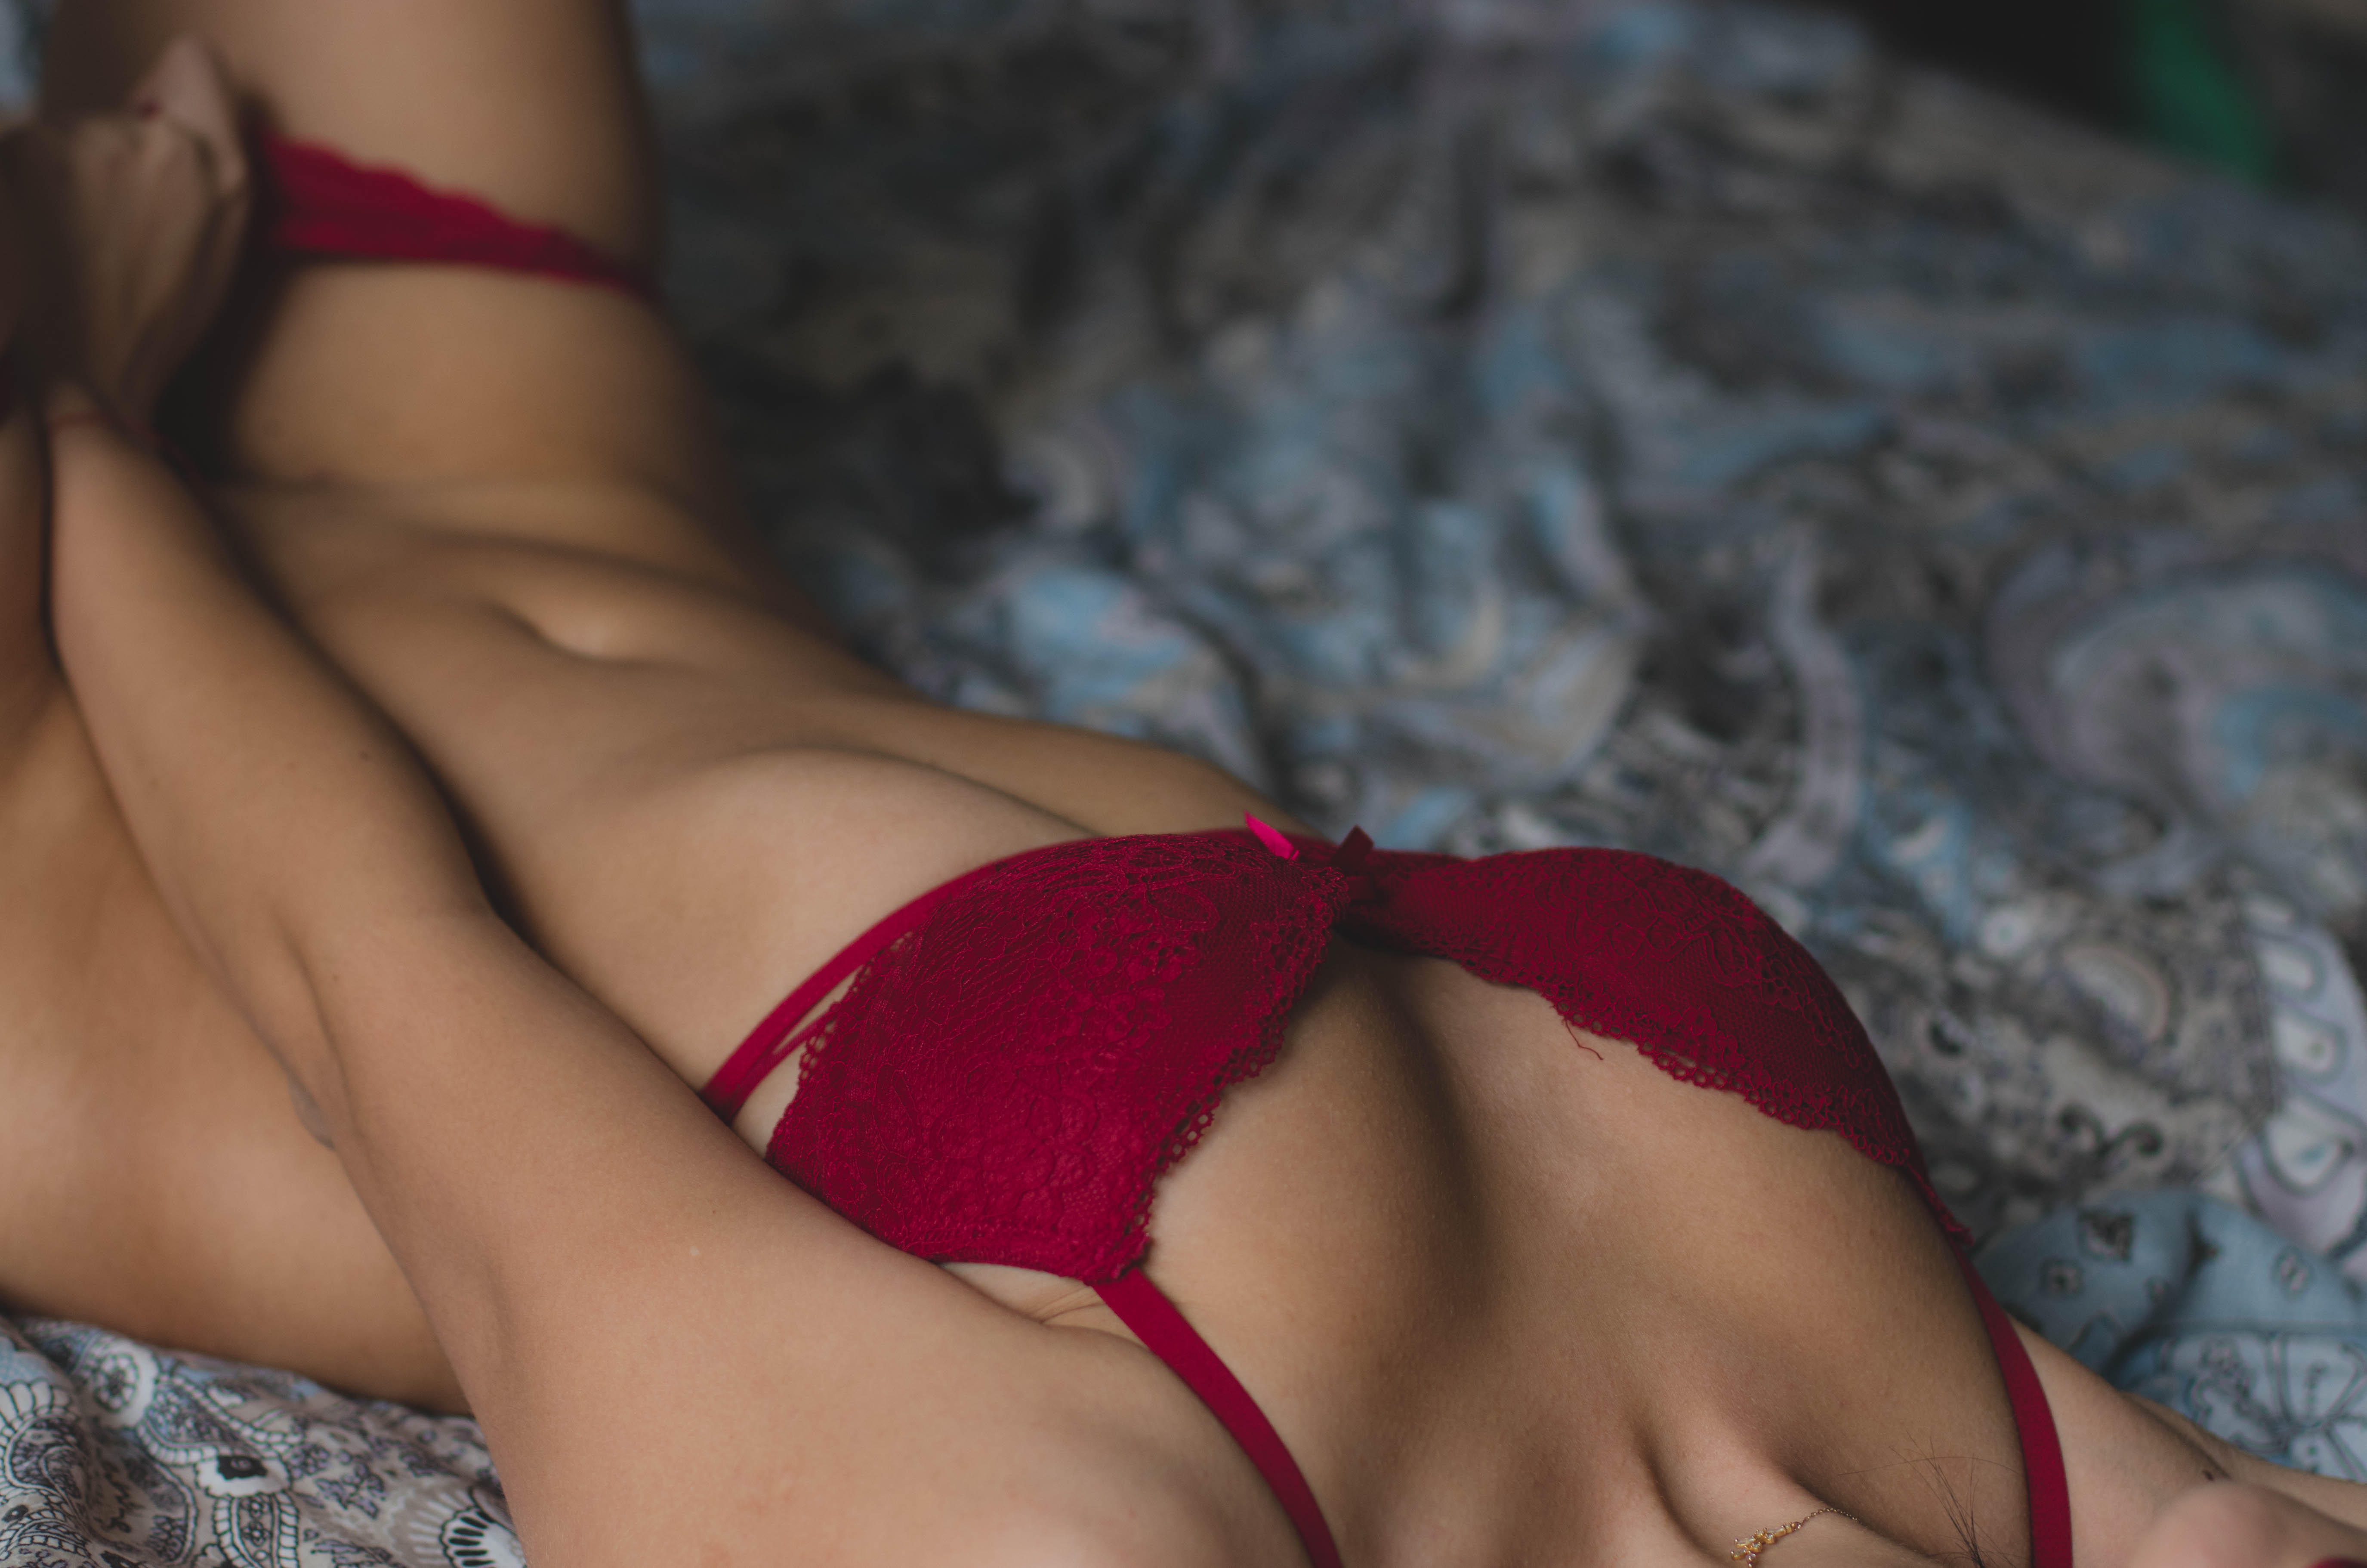 Sexy asiatische Model-Nacktheit